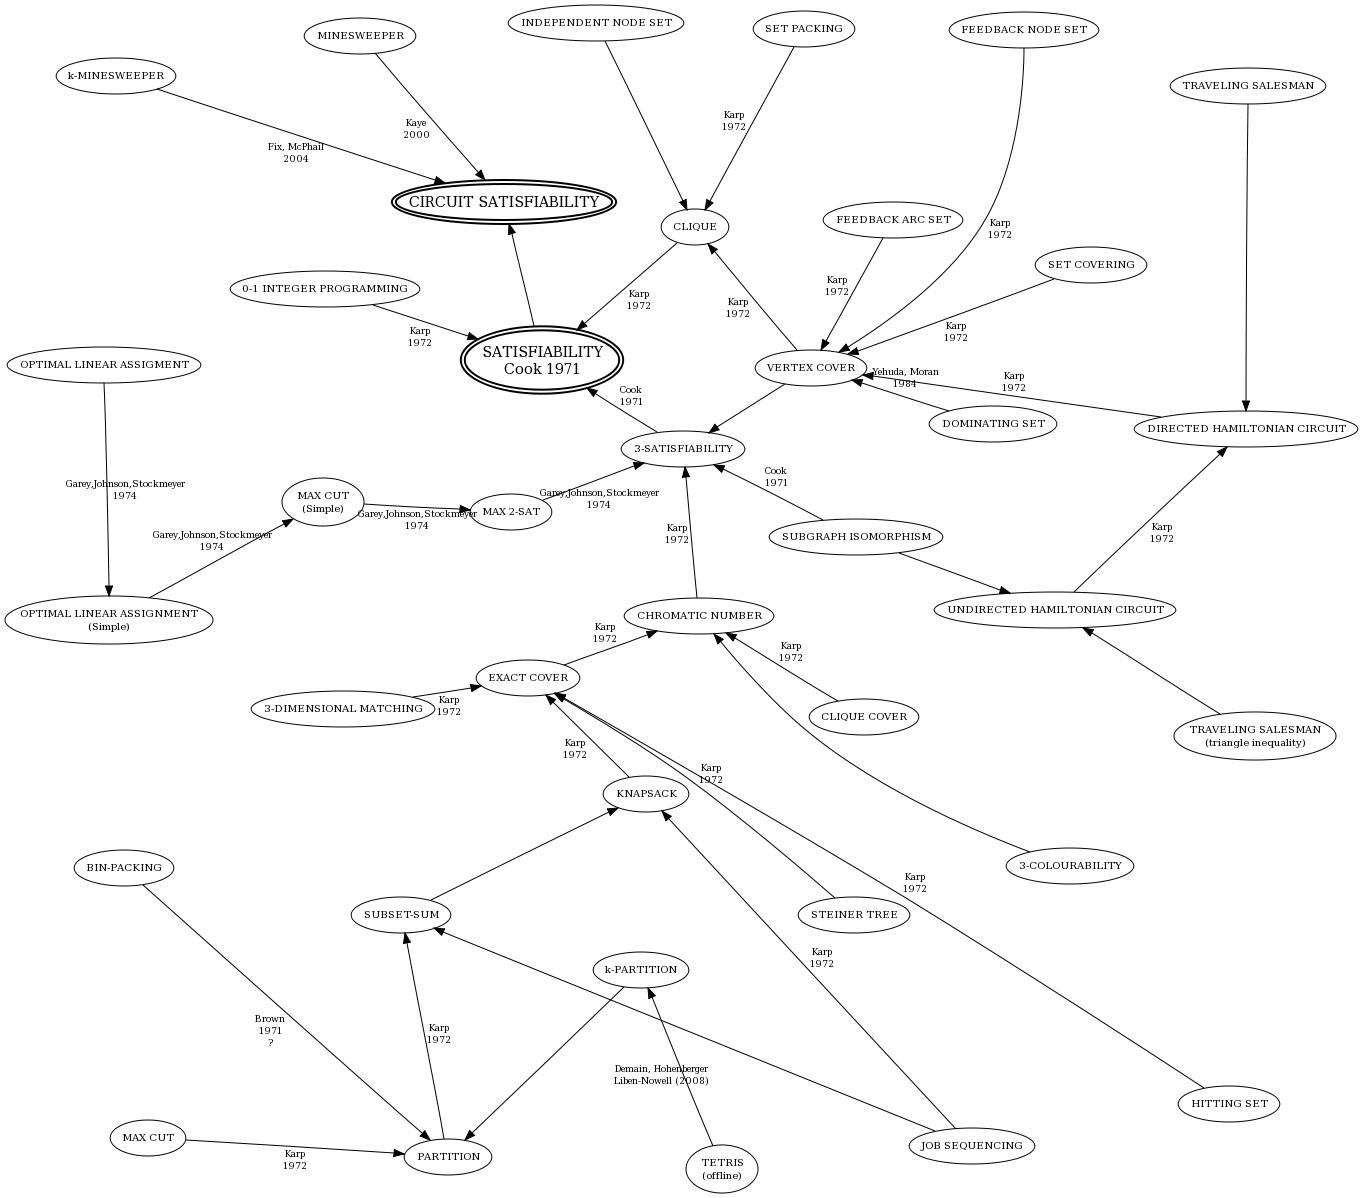 Edward Tufte forum: Design of causal diagrams: Barr art